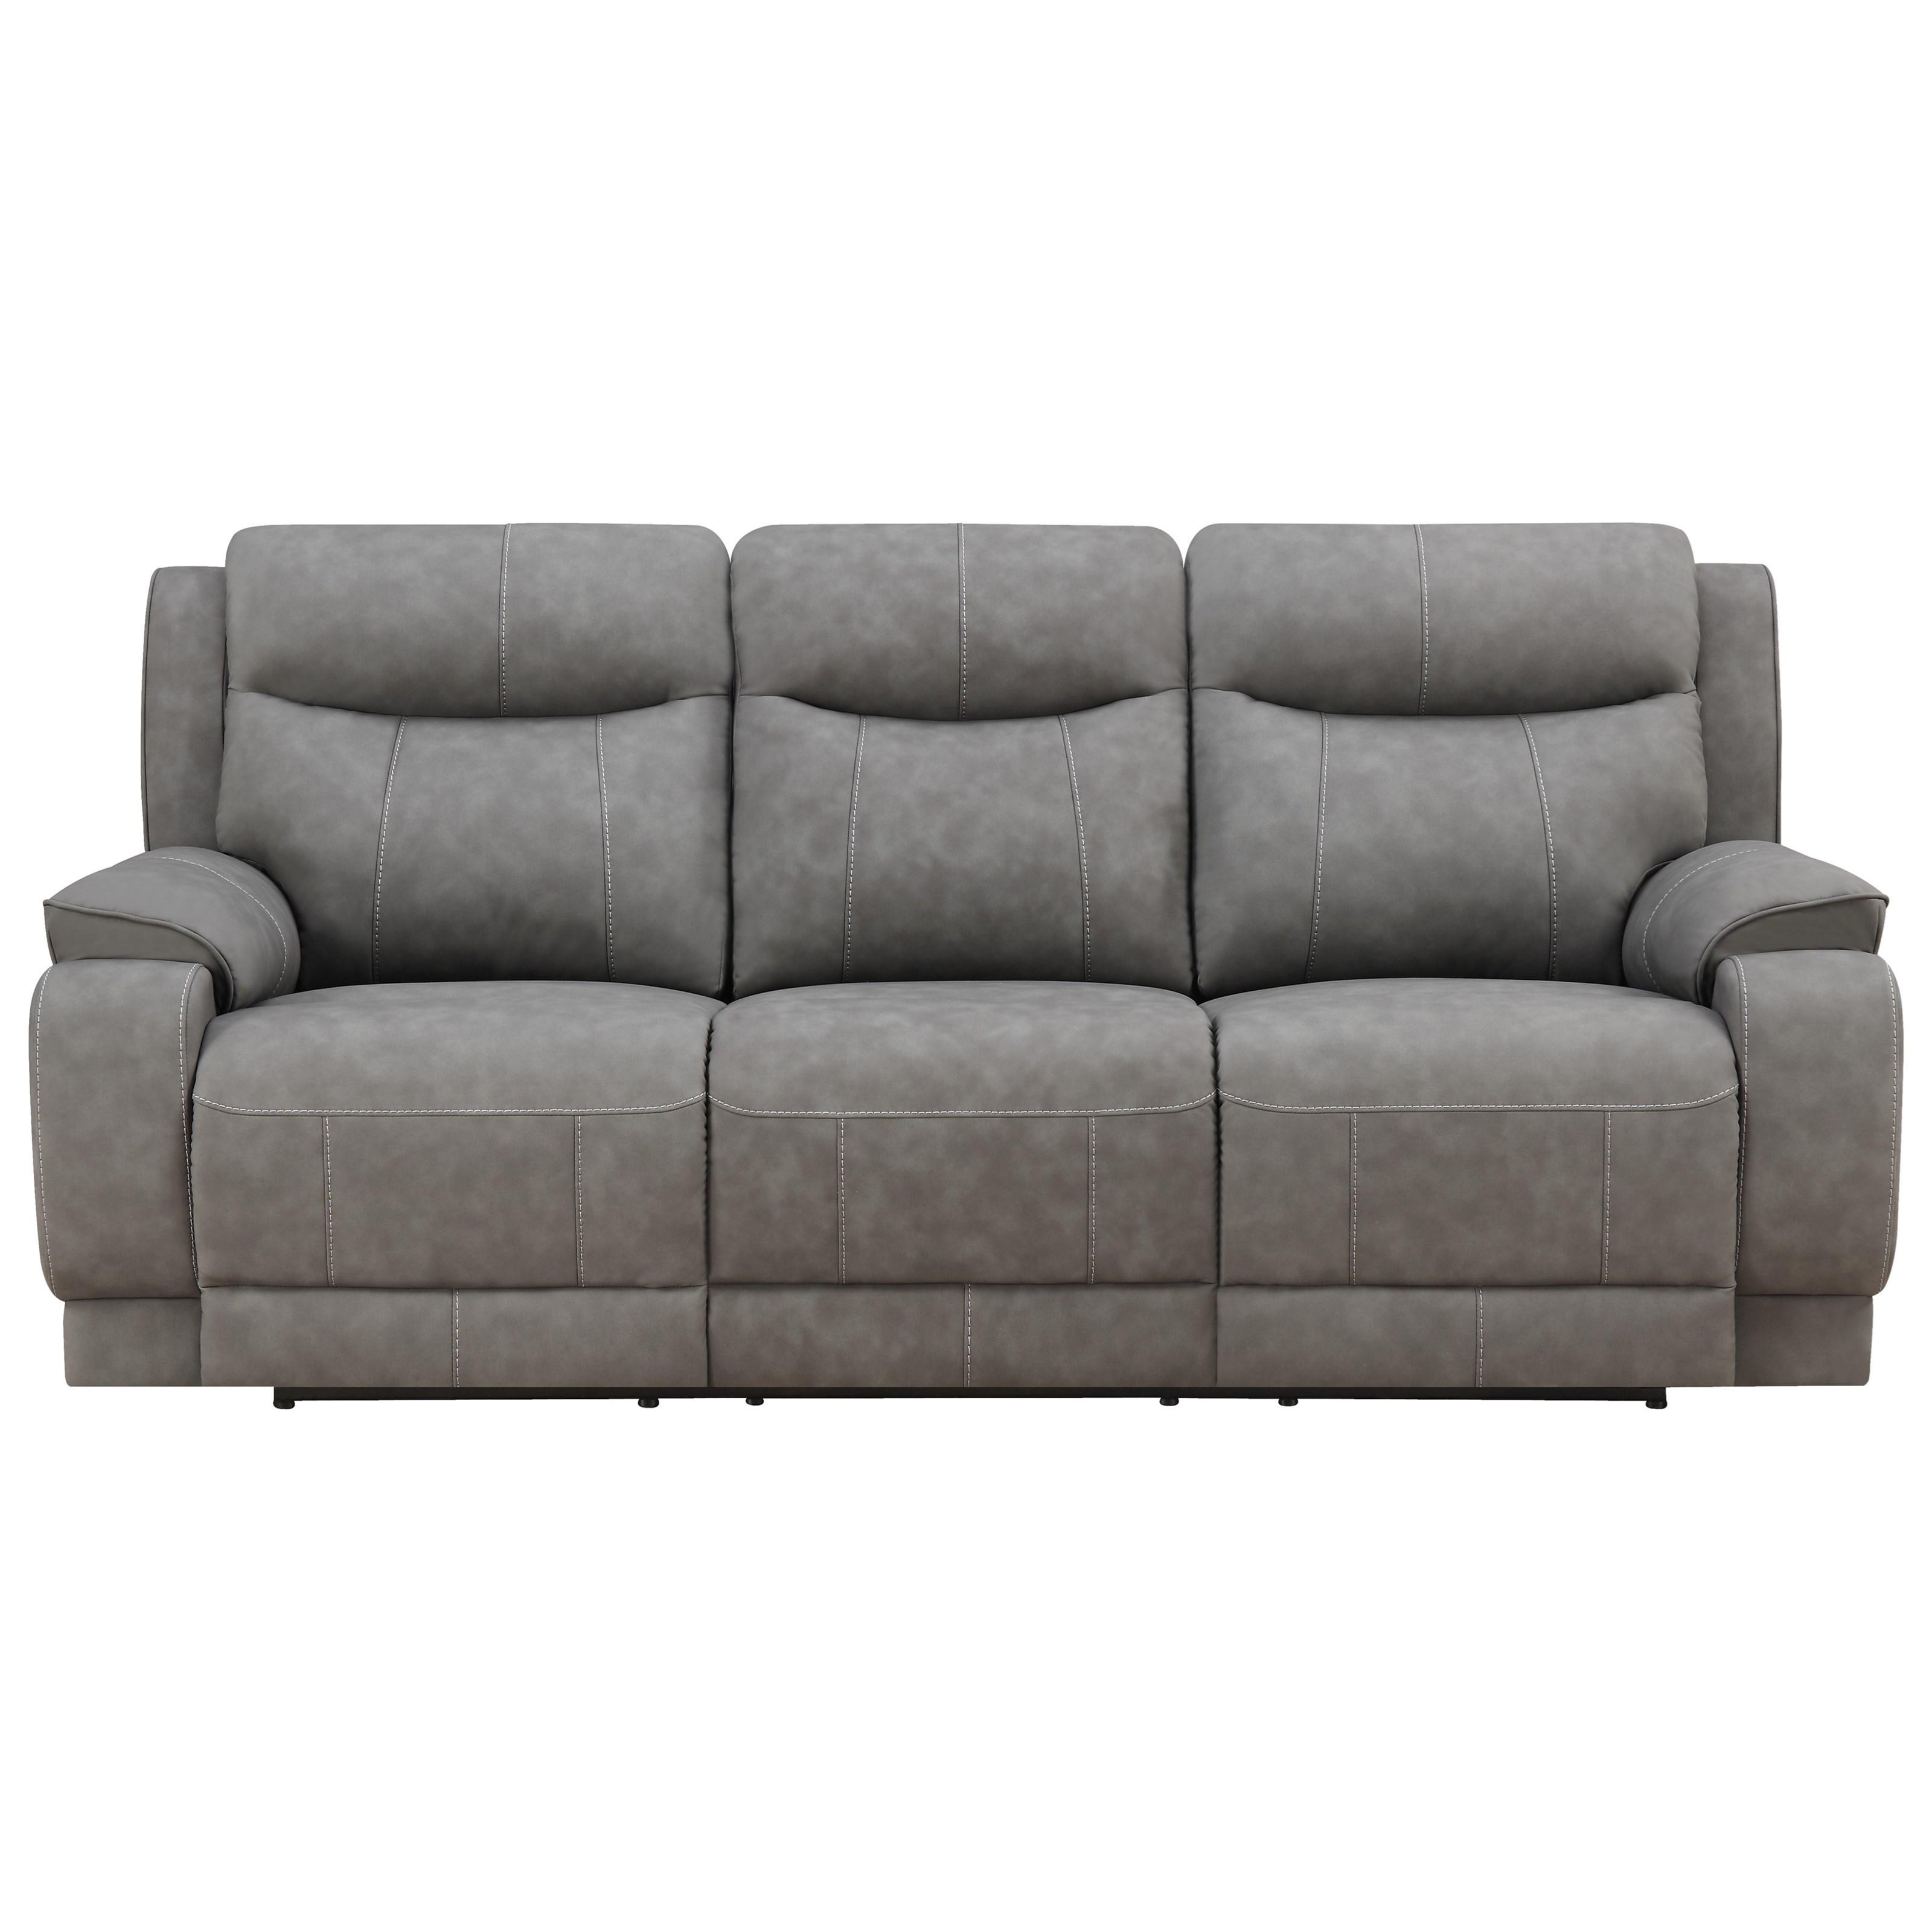 Humphrey-US Power Reclining Sofa by Klaussner International at Northeast Factory Direct